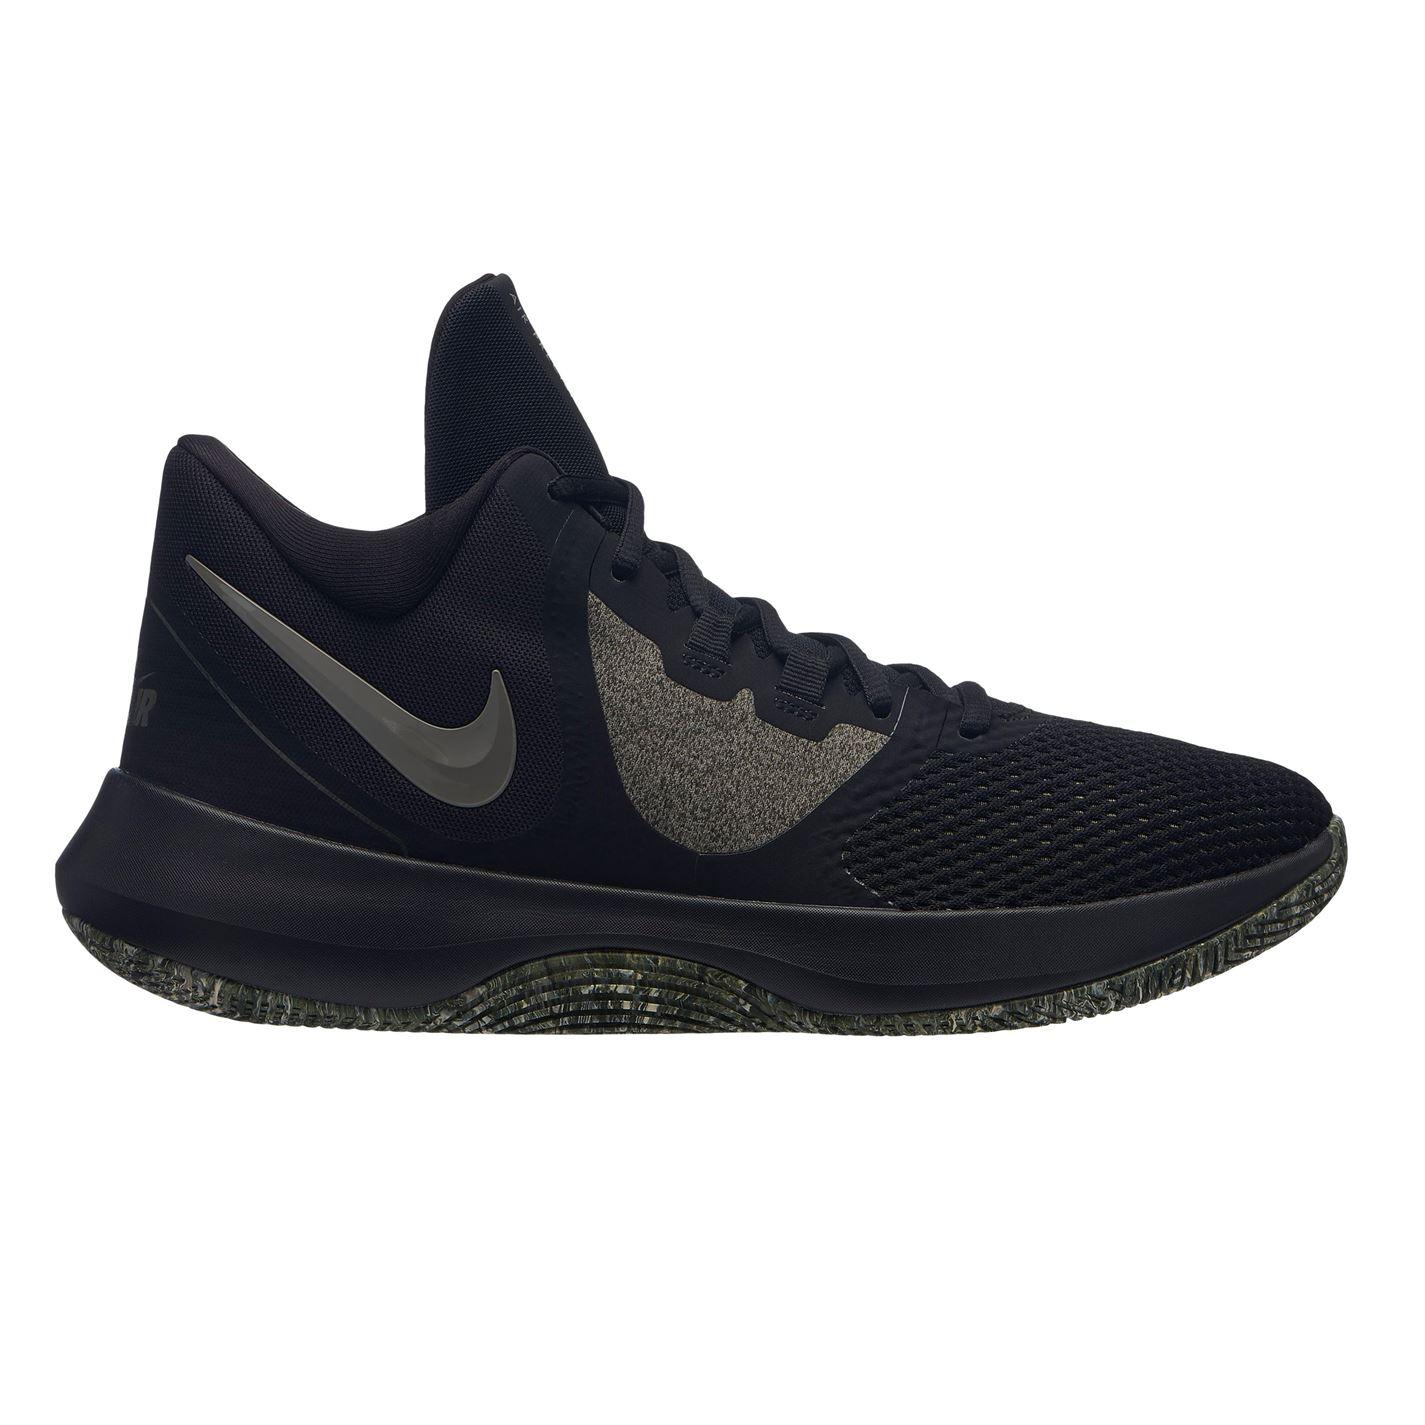 basketbalové boty boty Nike Air Precision II Shoes pánské